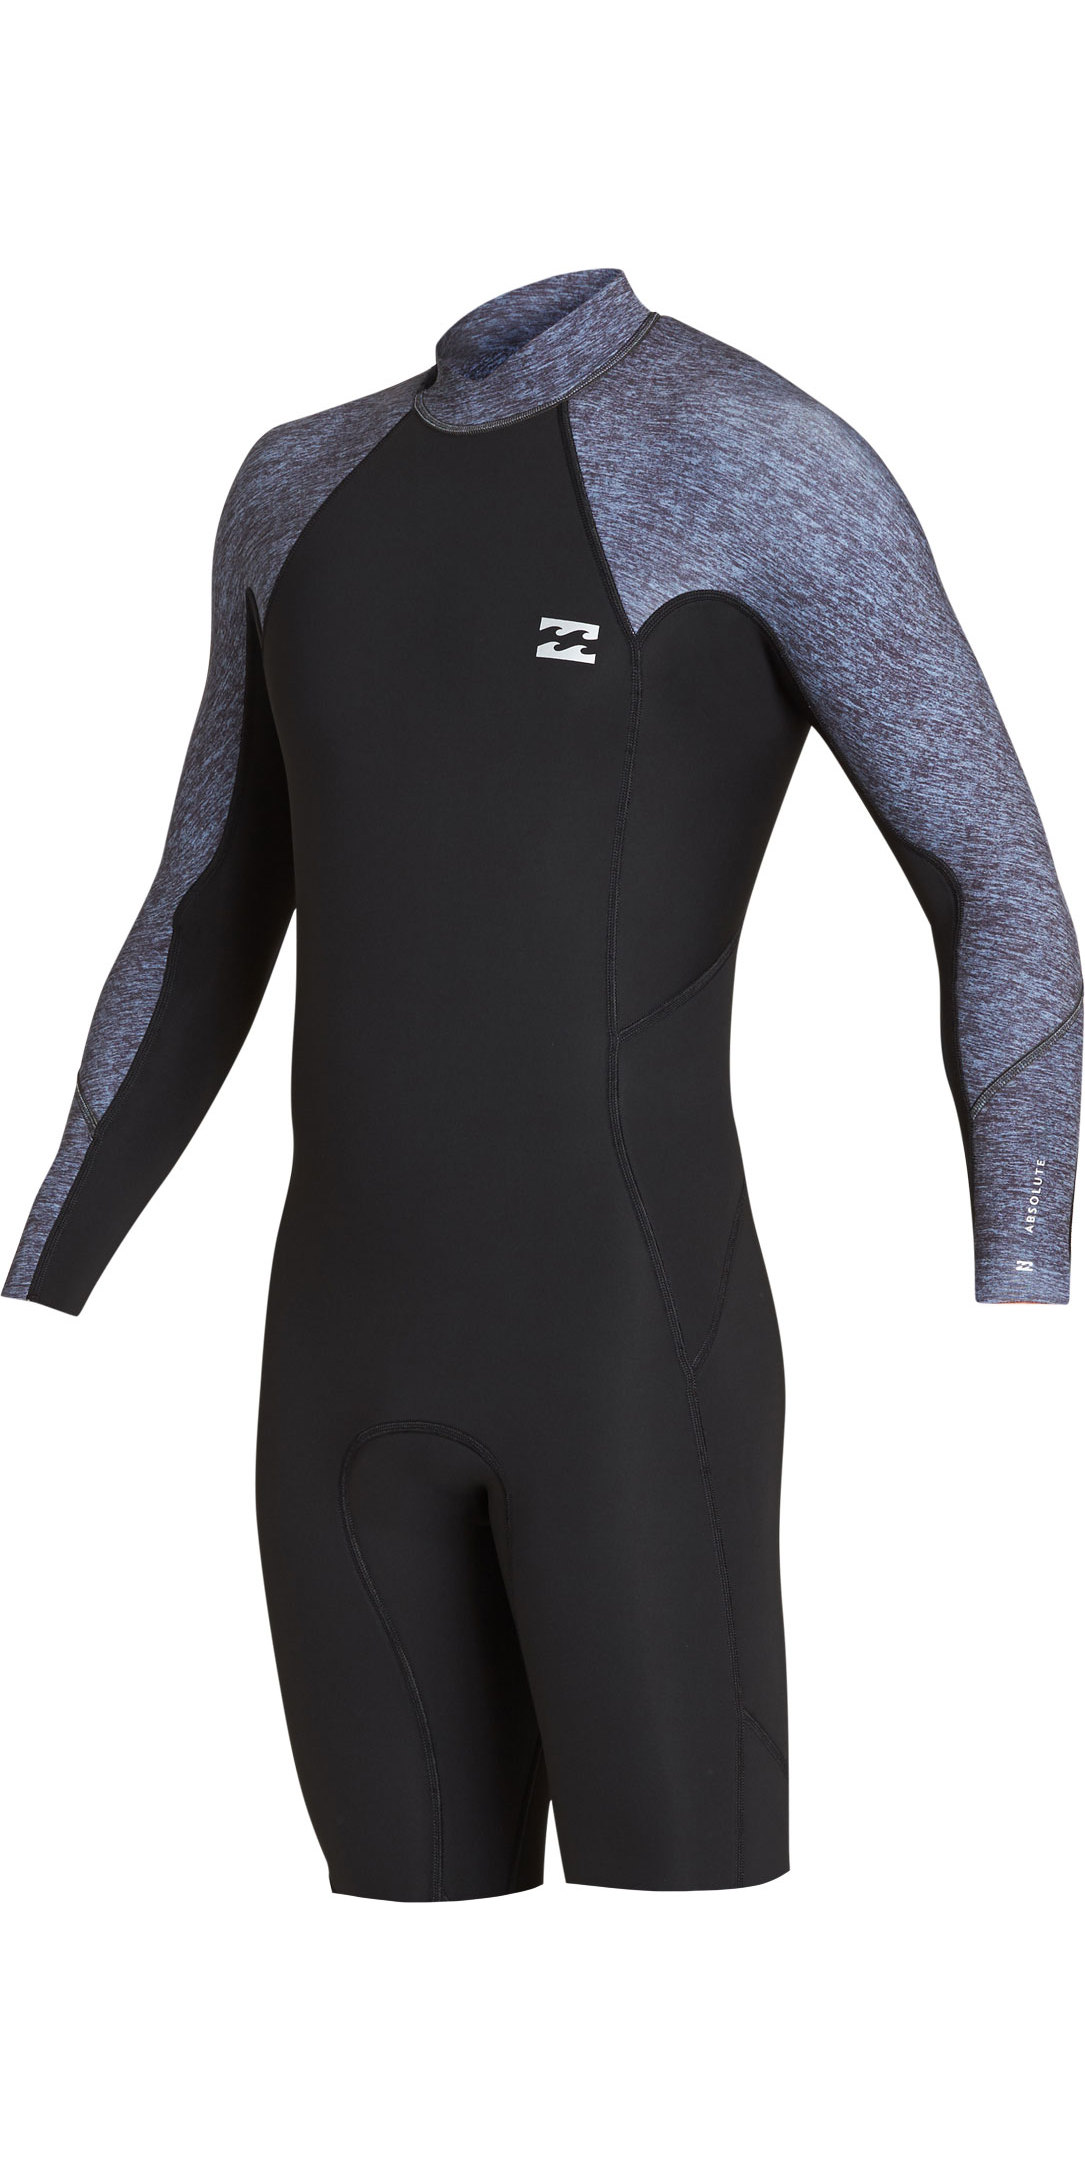 2019 Billabong Mens 2mm Furnace Absolute Long Sleeve Gbs Back Zip Shorty  Wetsuit Grey Heather N42m21  1a4371157011